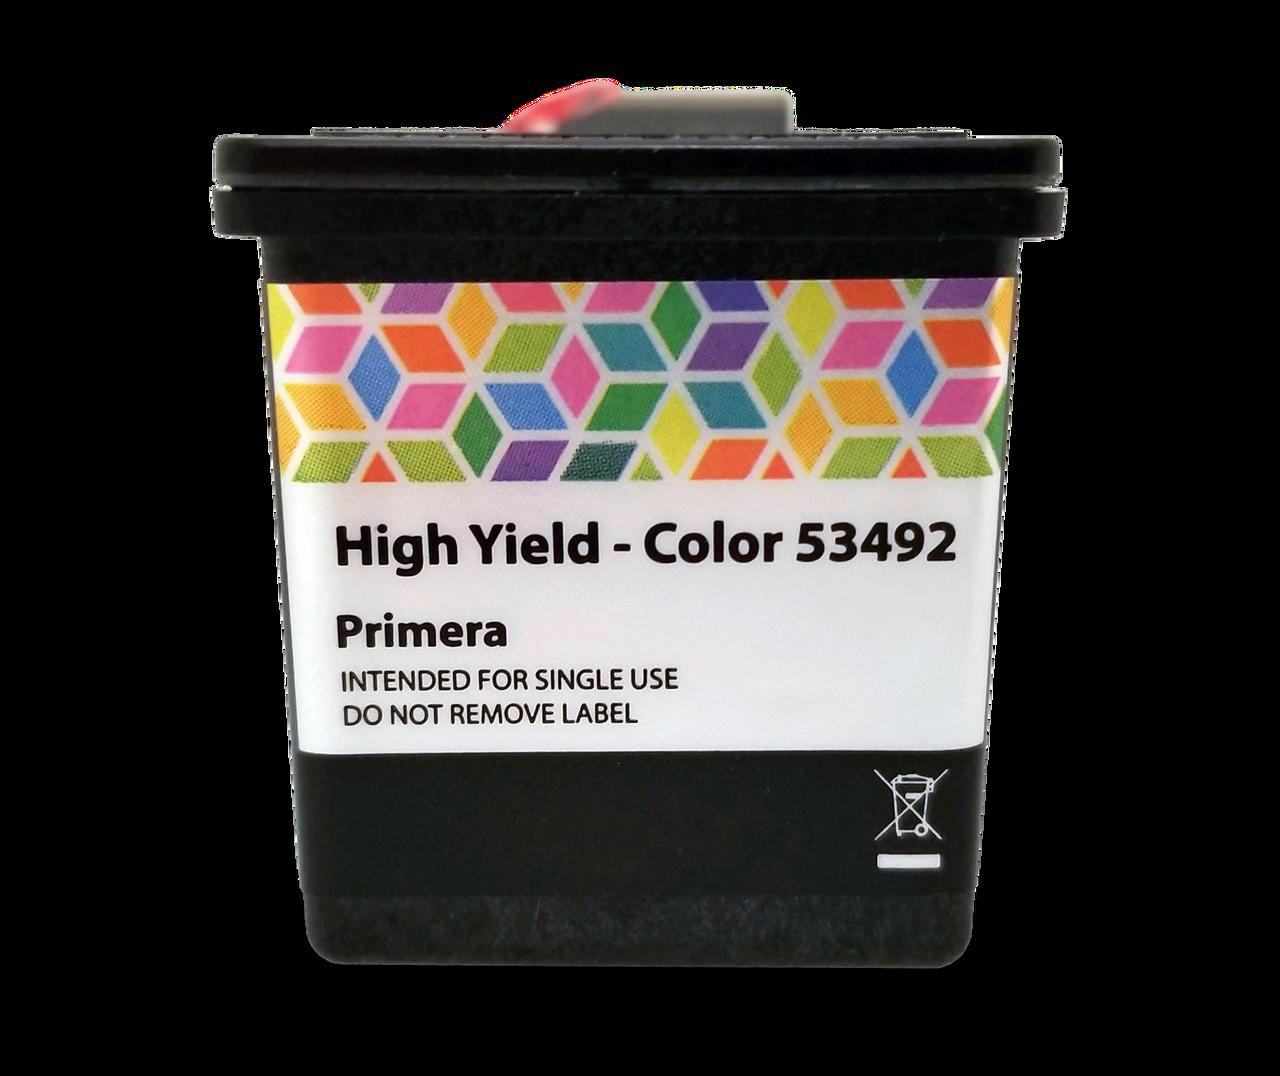 Primera LX910 Dye Color Ink Cartridge - 53492